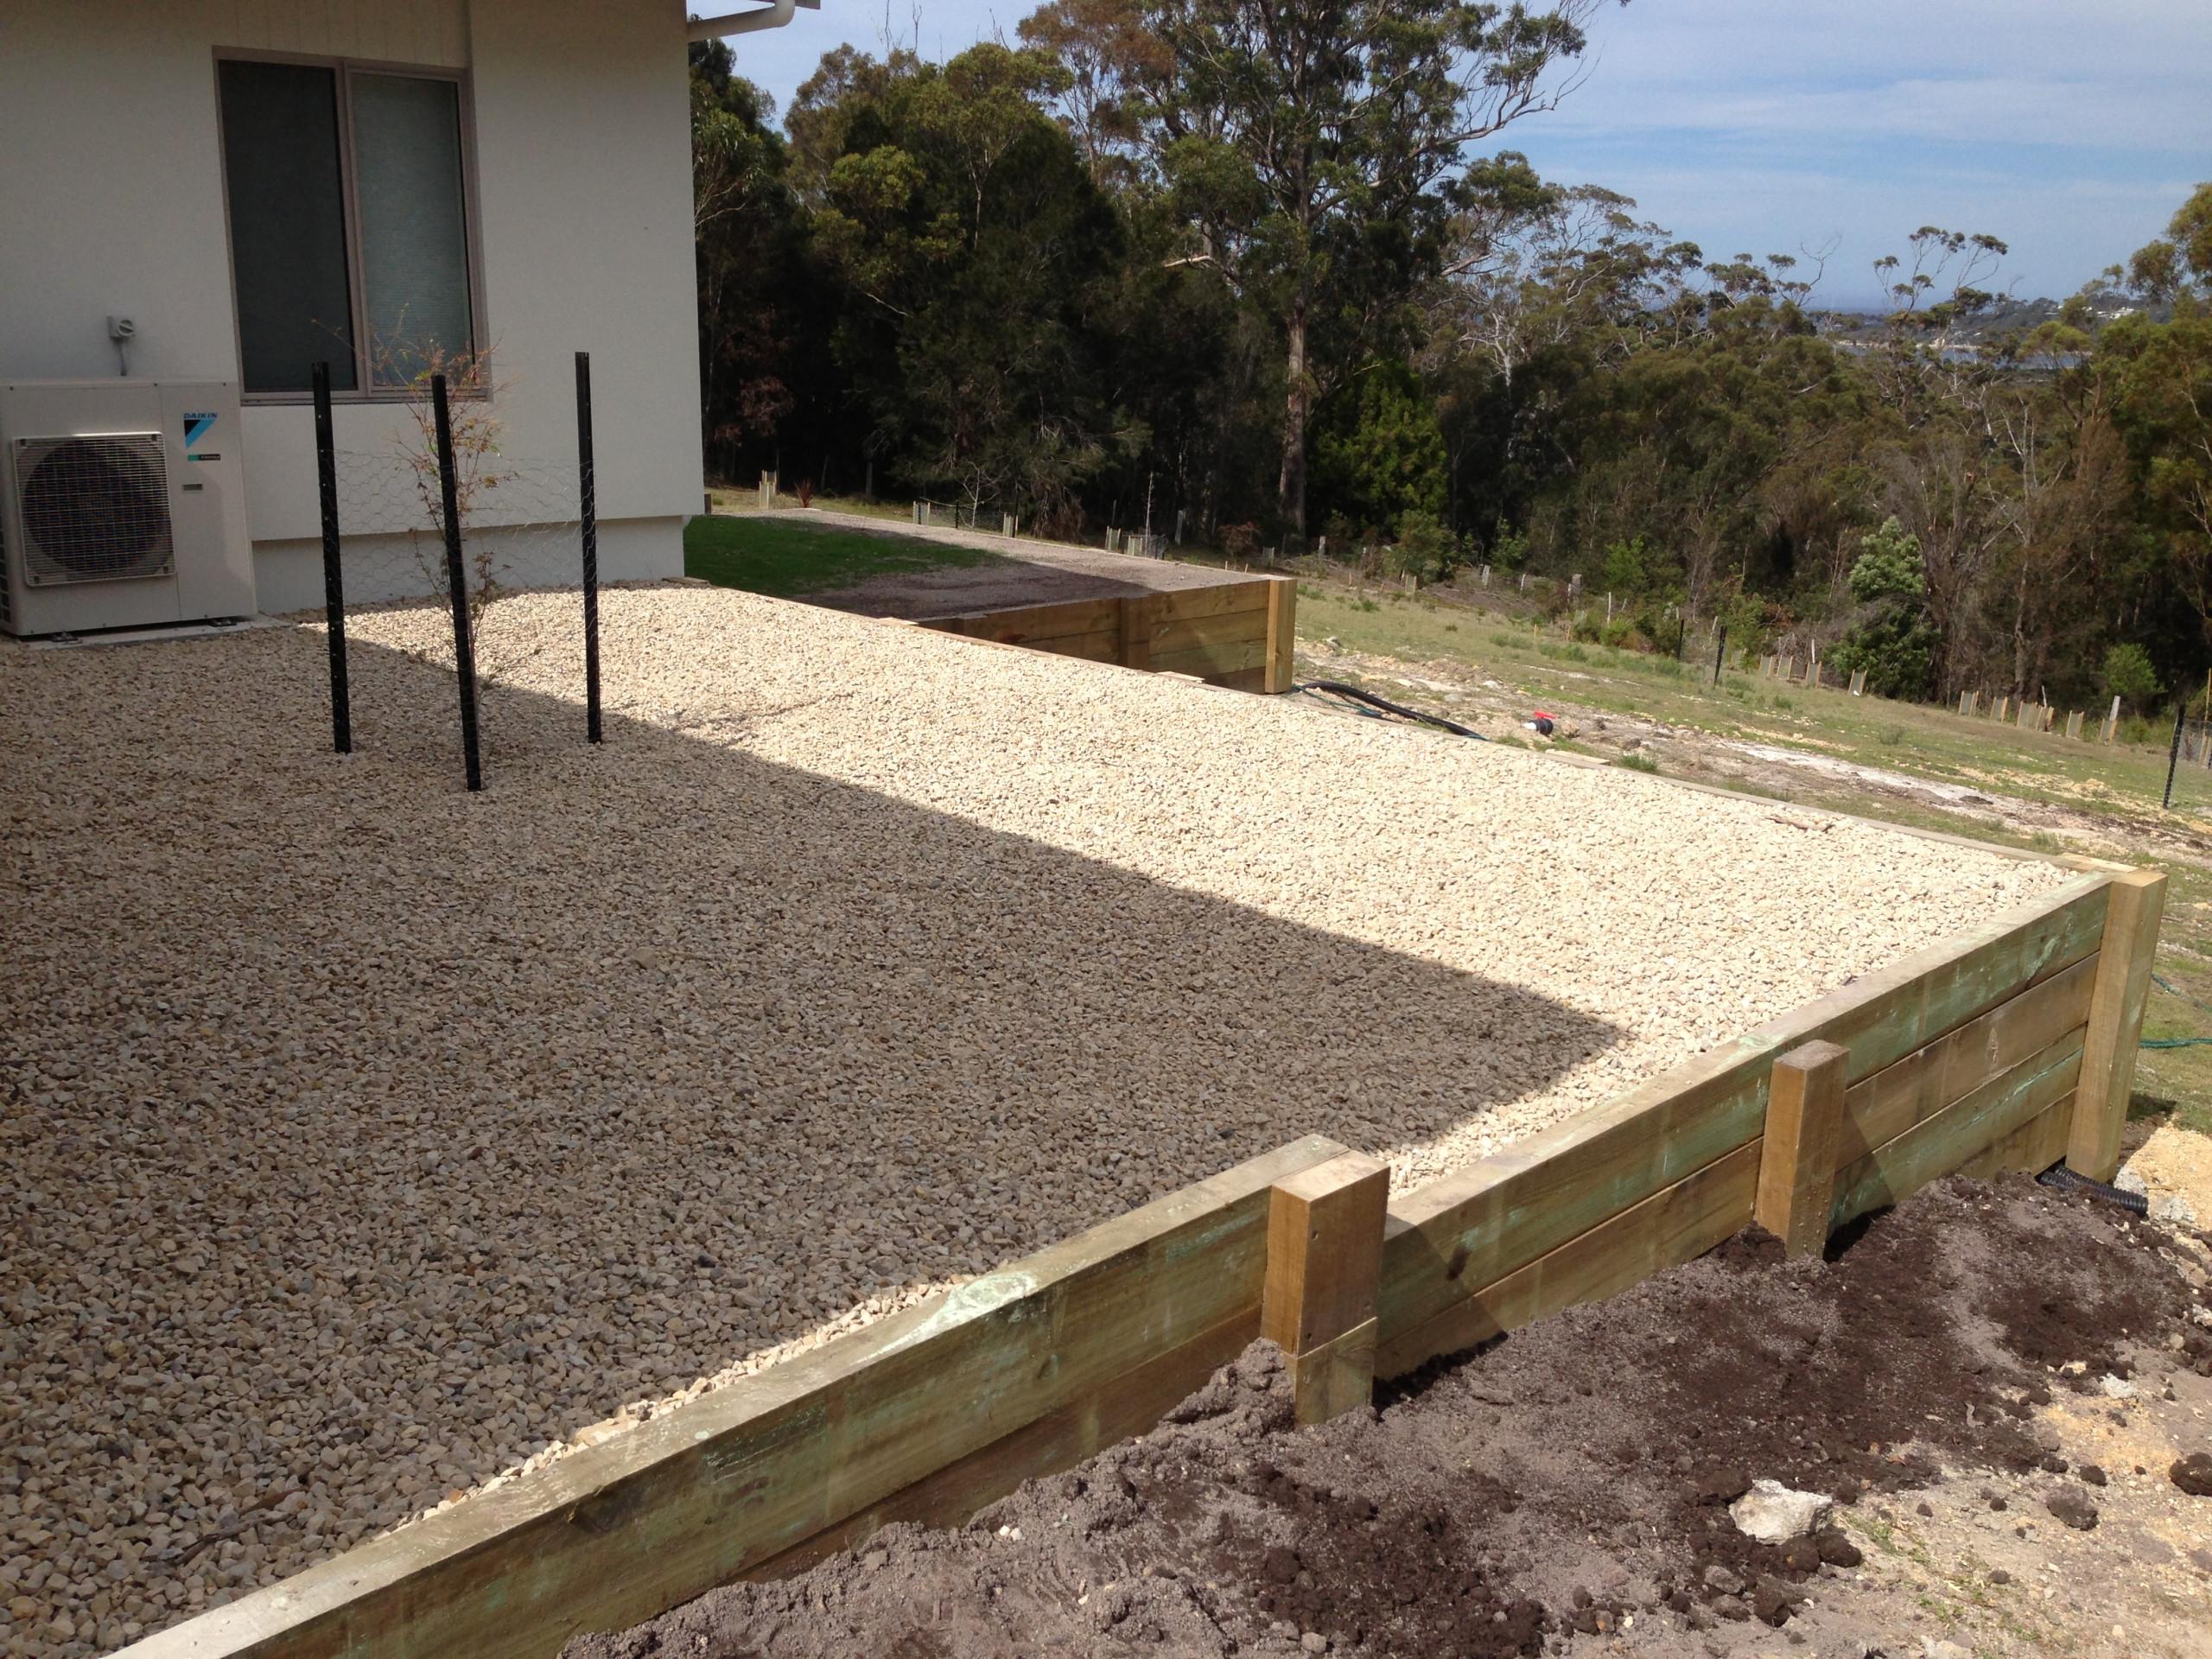 Timber sleeper retaining walls